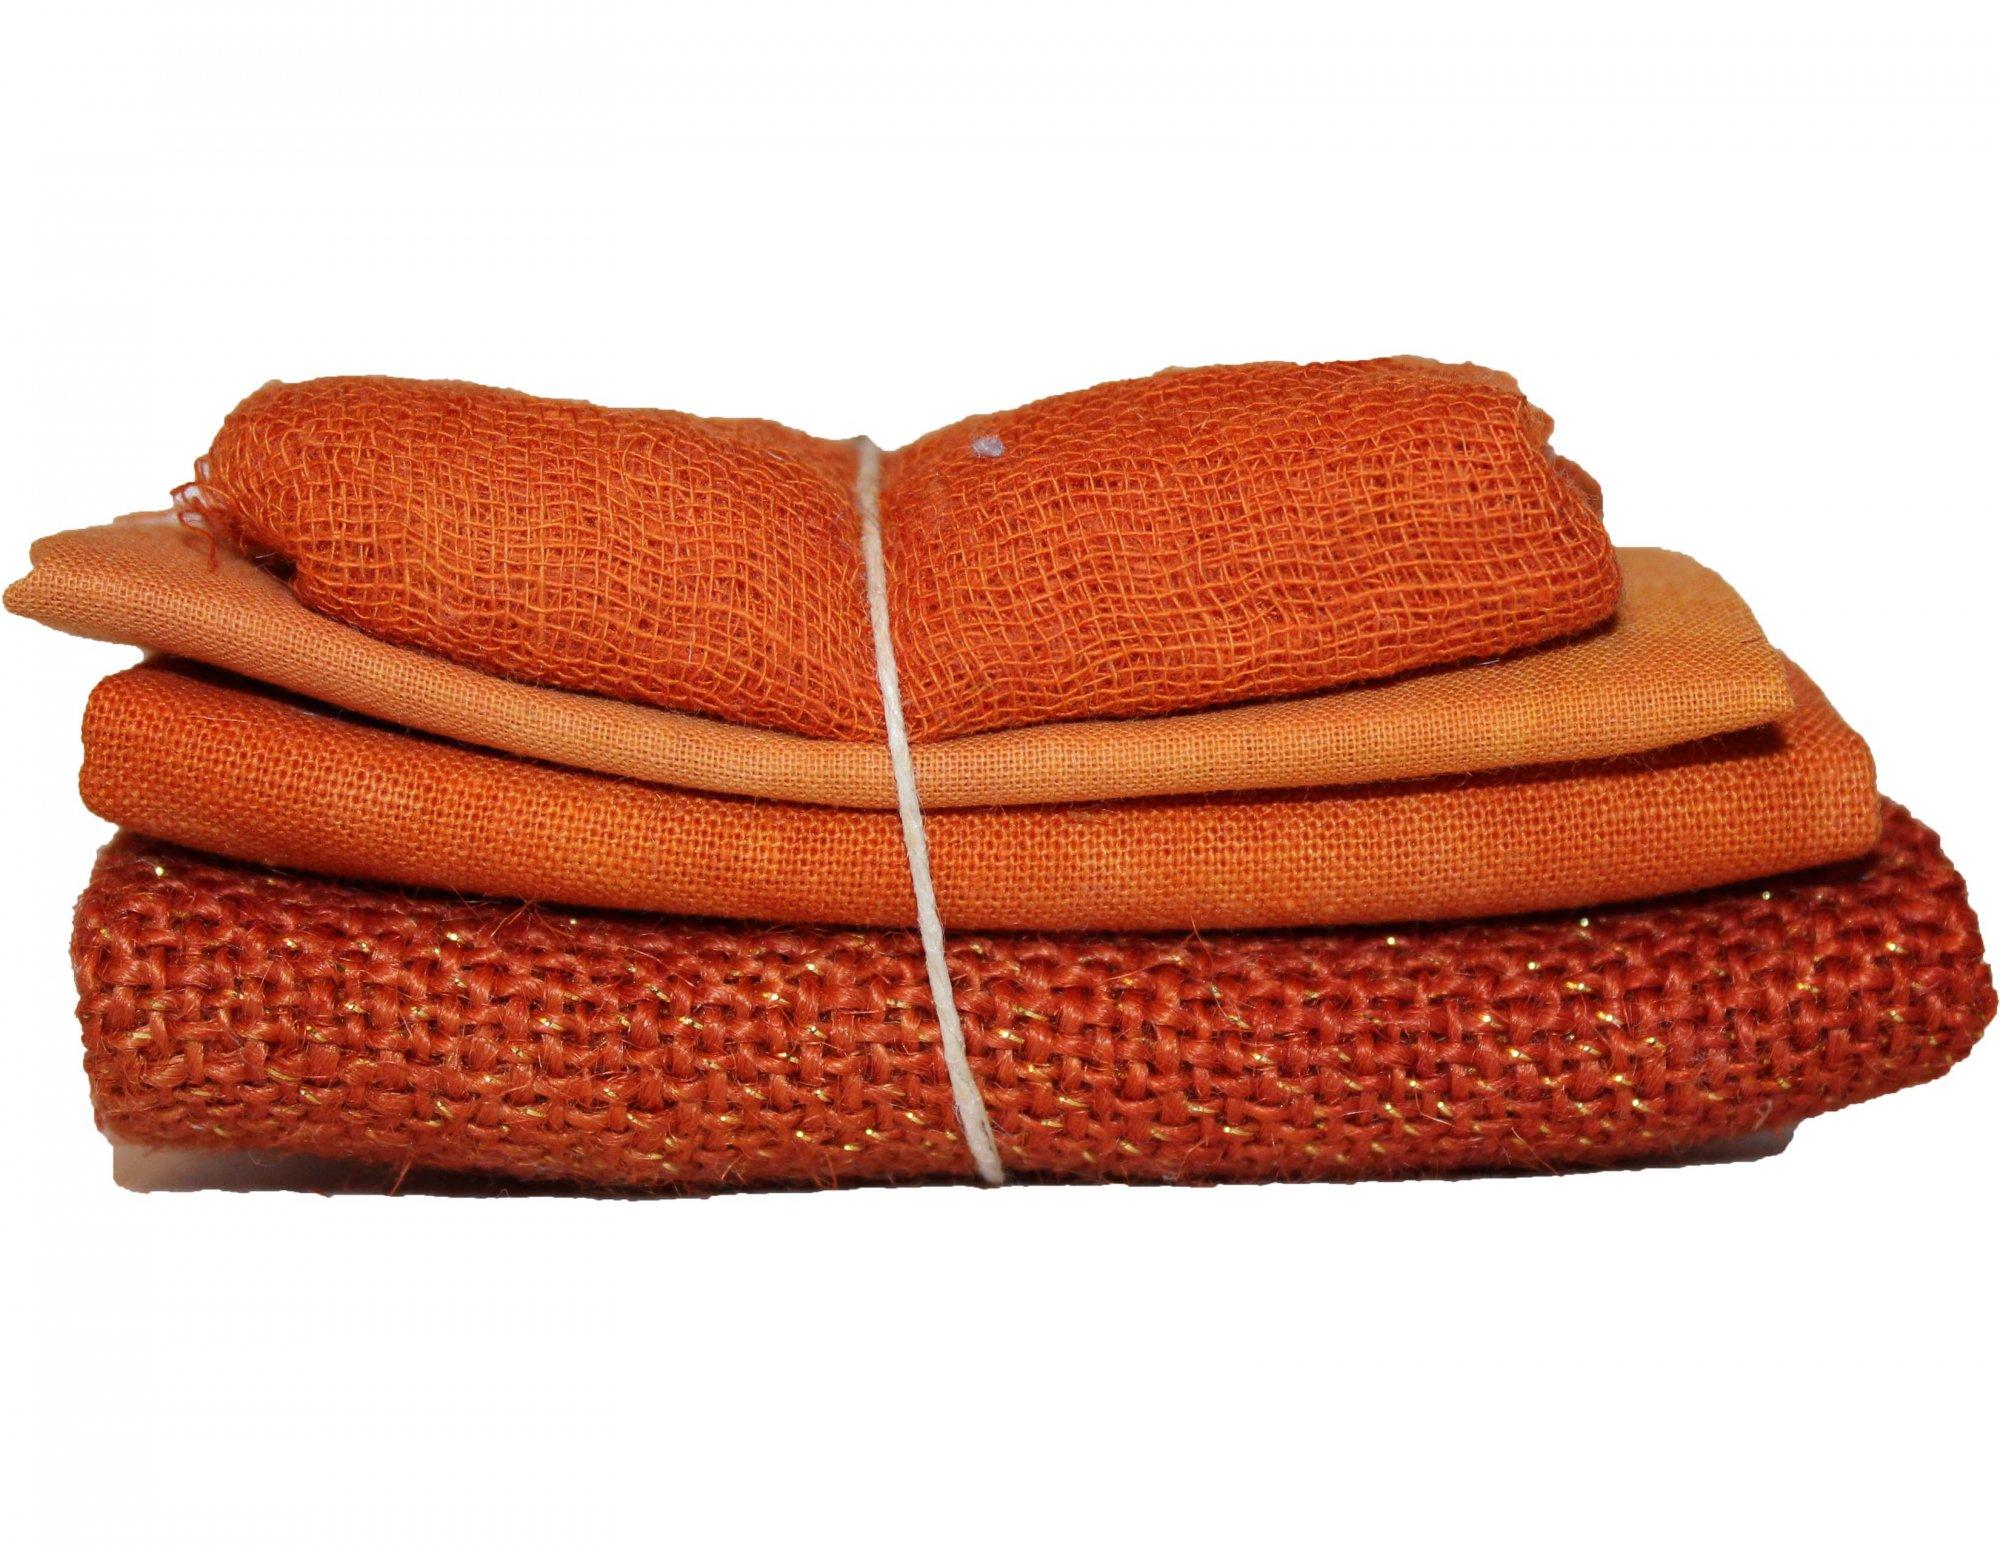 Sedona Sparkle Bindle - Cheesecloth, Organdy, Linen, & Sparkle Burlap